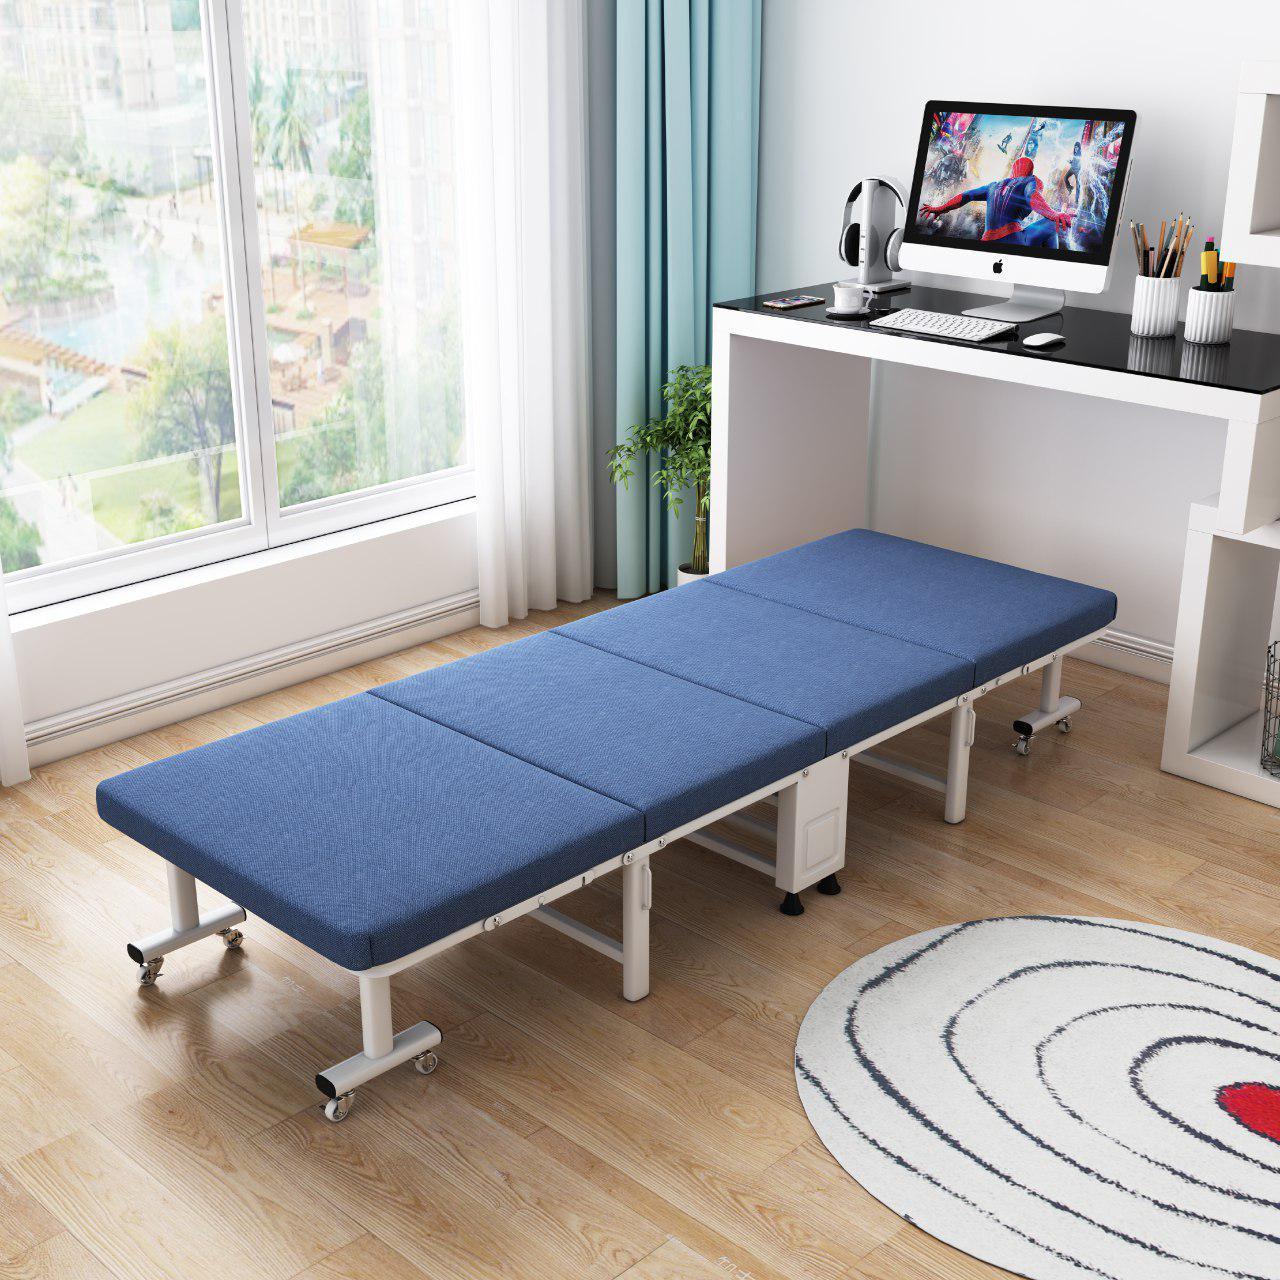 MYSEAT.sg ELOISE Premium Japanese Foldable Single Bed (Preorder)